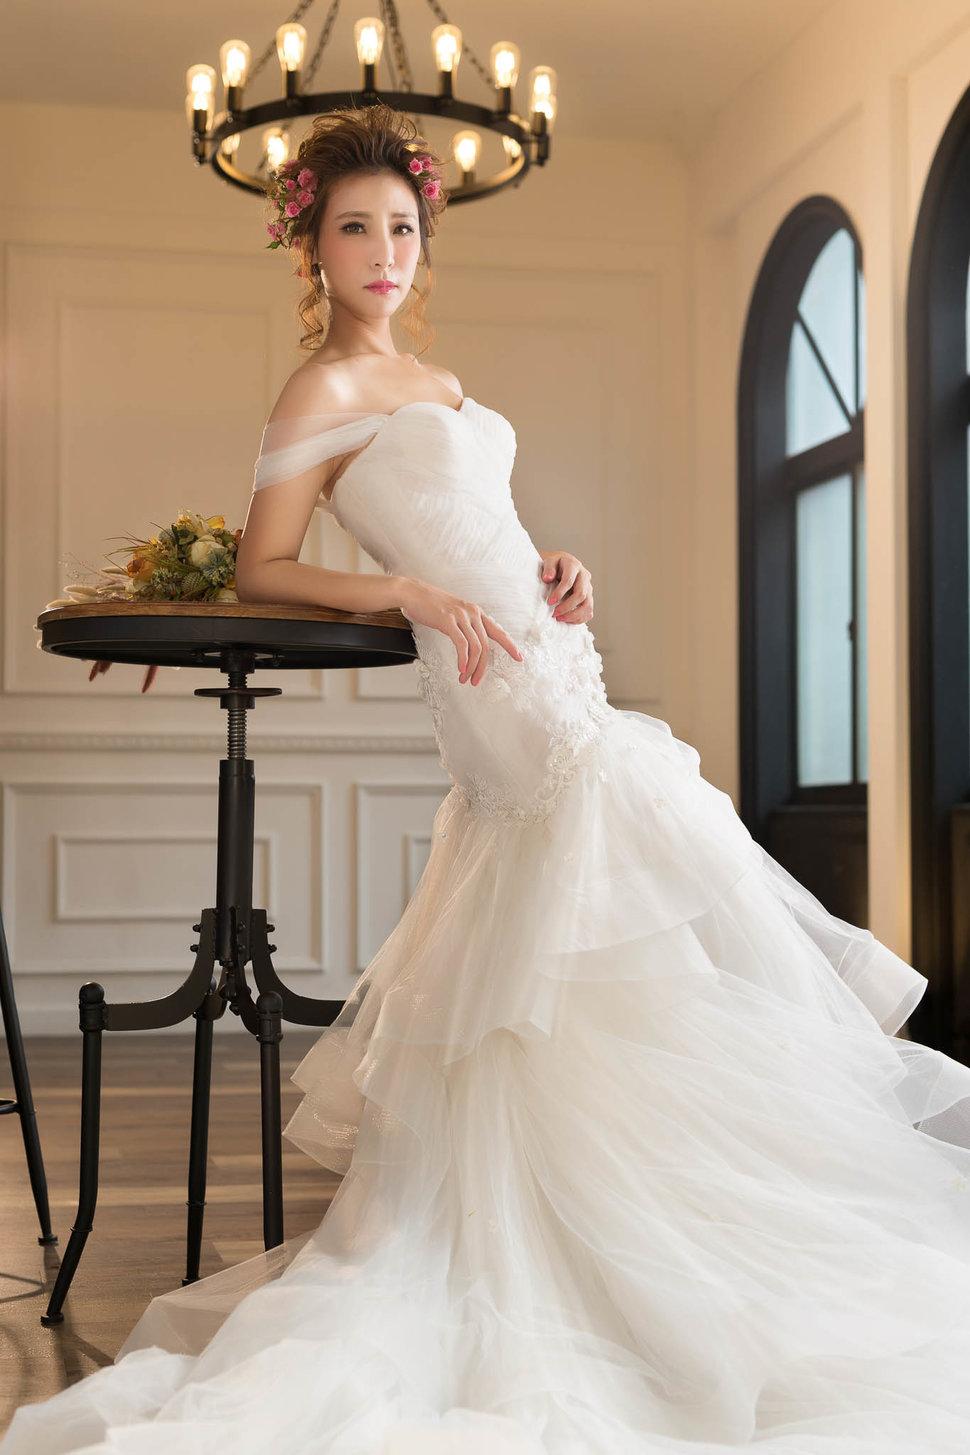 18PHOTO自主婚紗-潤兒(編號:406245) - 18PHOTO 婚紗影像攝影工作室 - 結婚吧